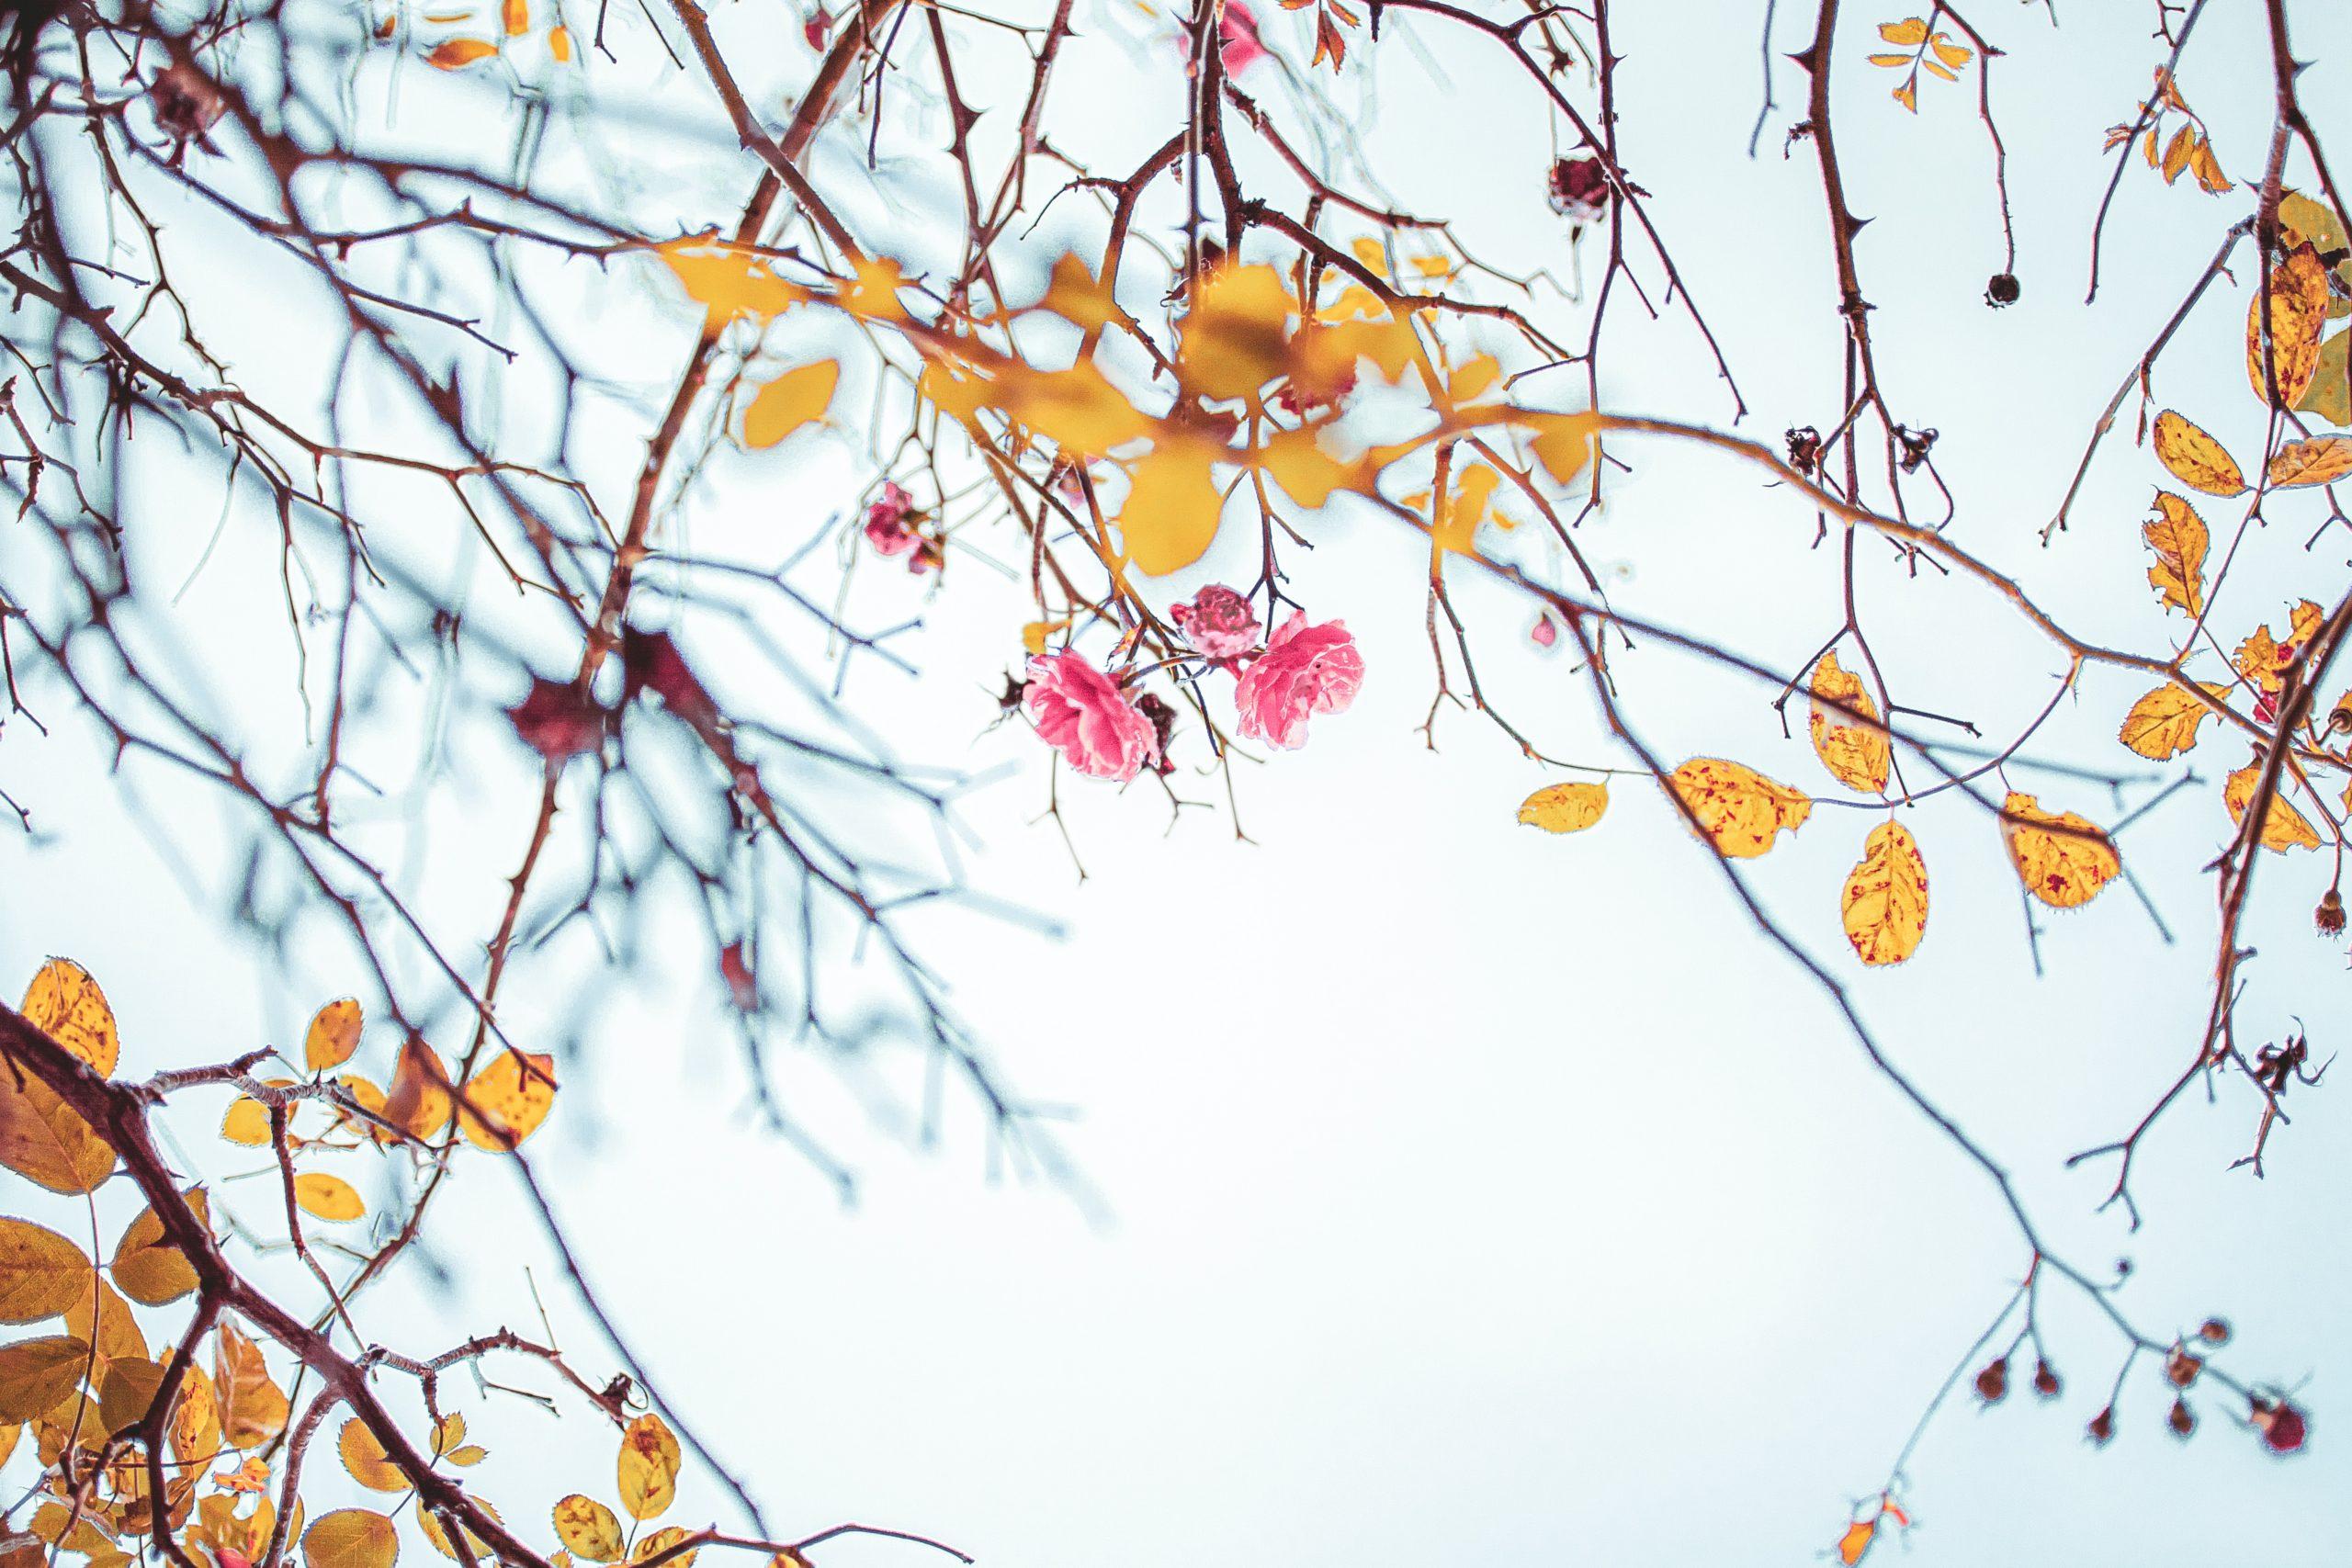 Hindi Inspirational poetry on life - मृत टहनियाँ > अर्चना की रचना